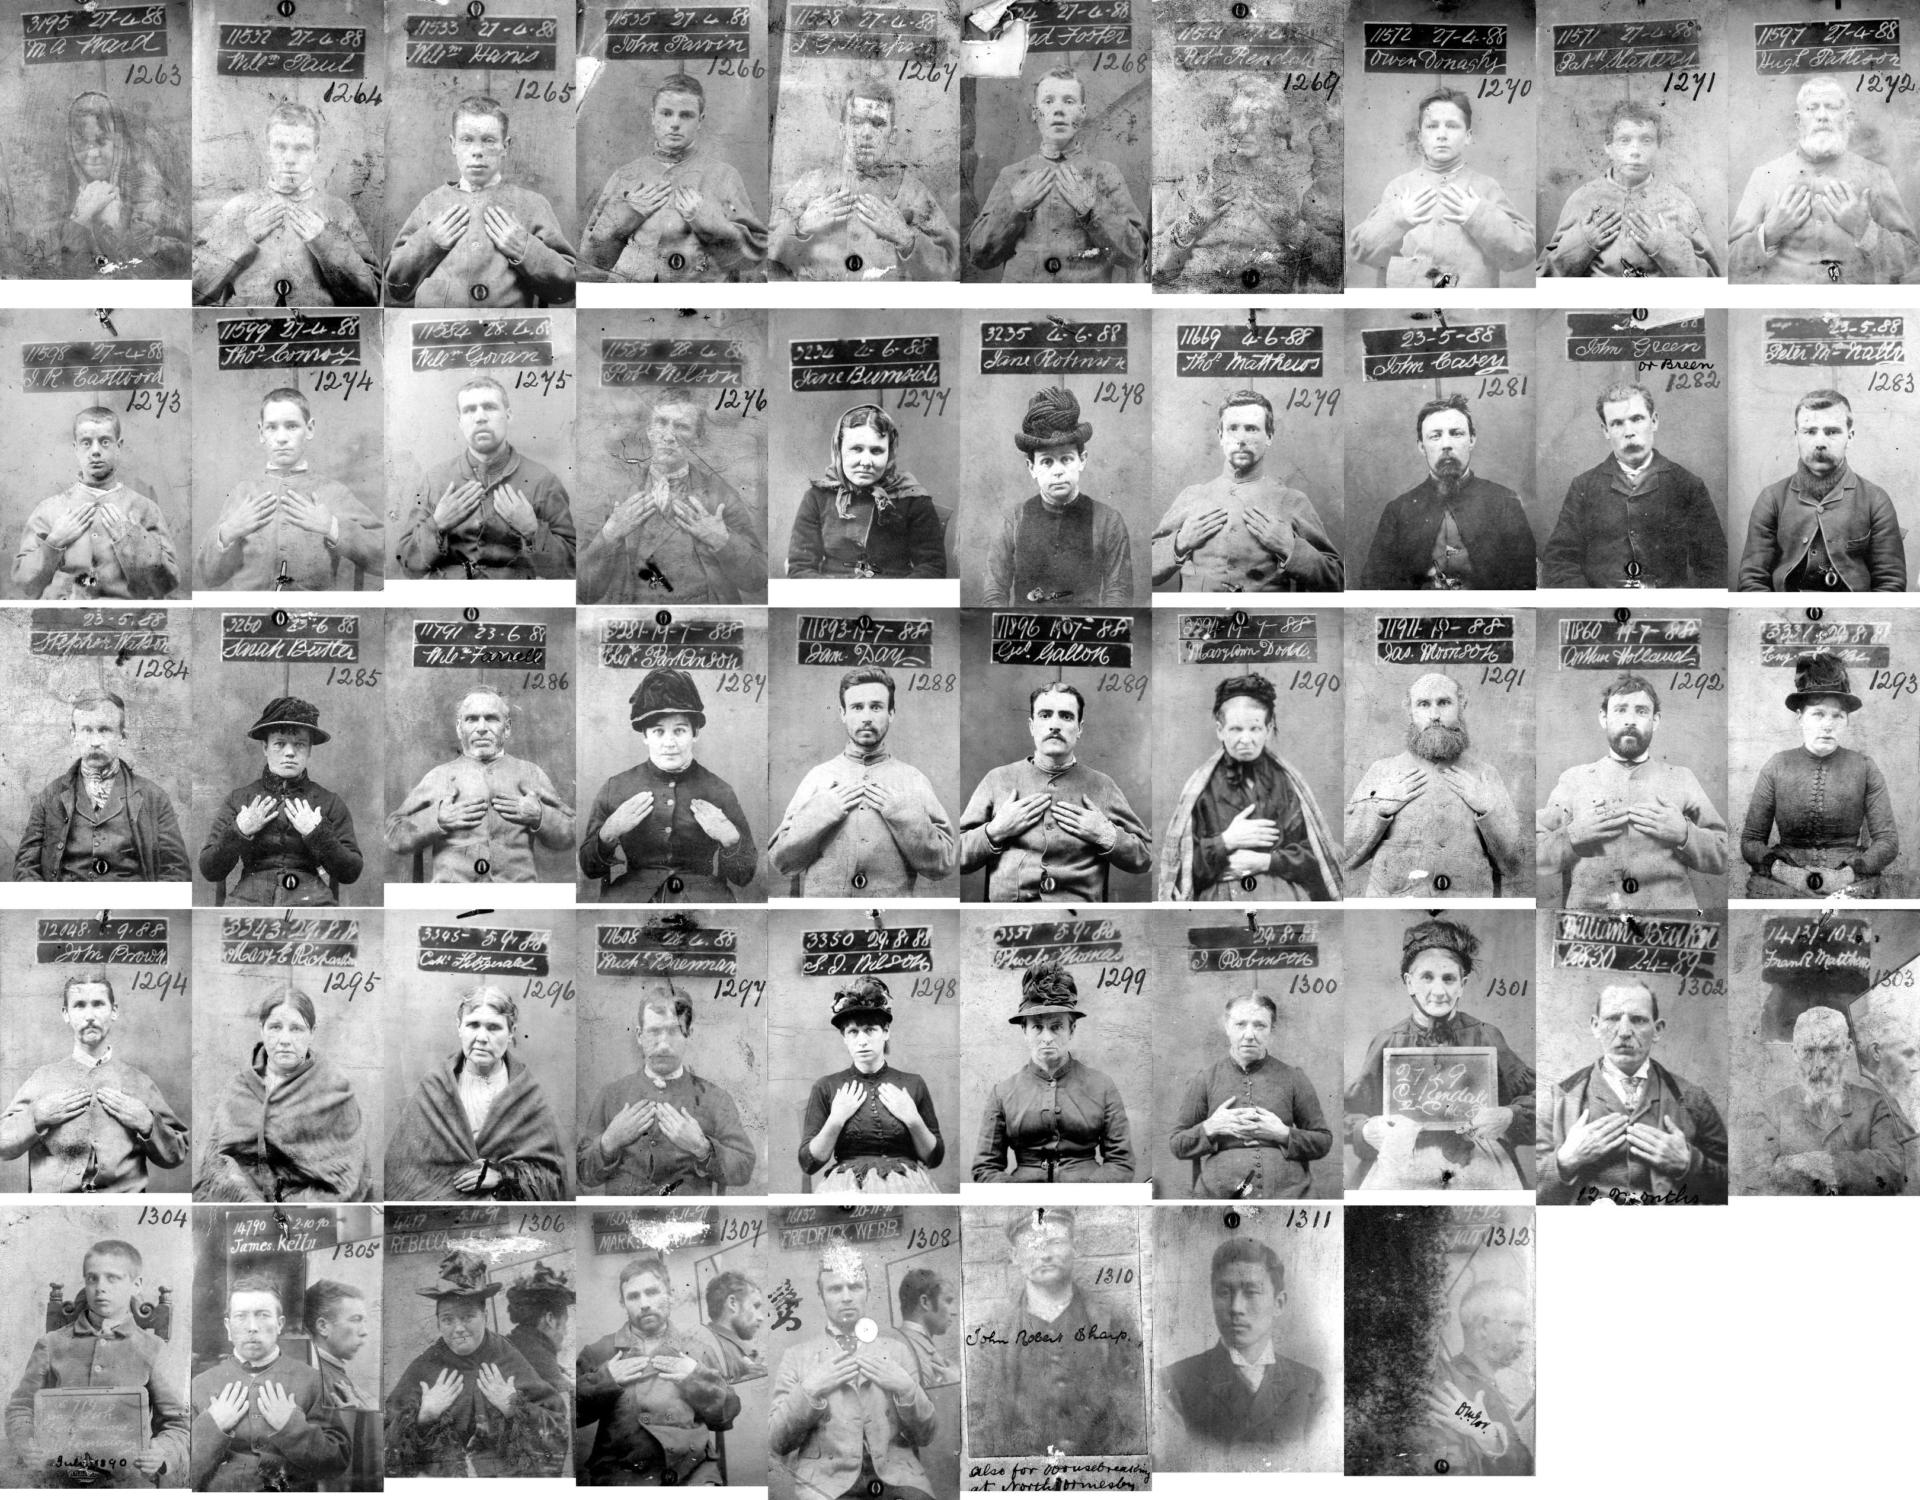 An image of the Victorian Mug Shot Book